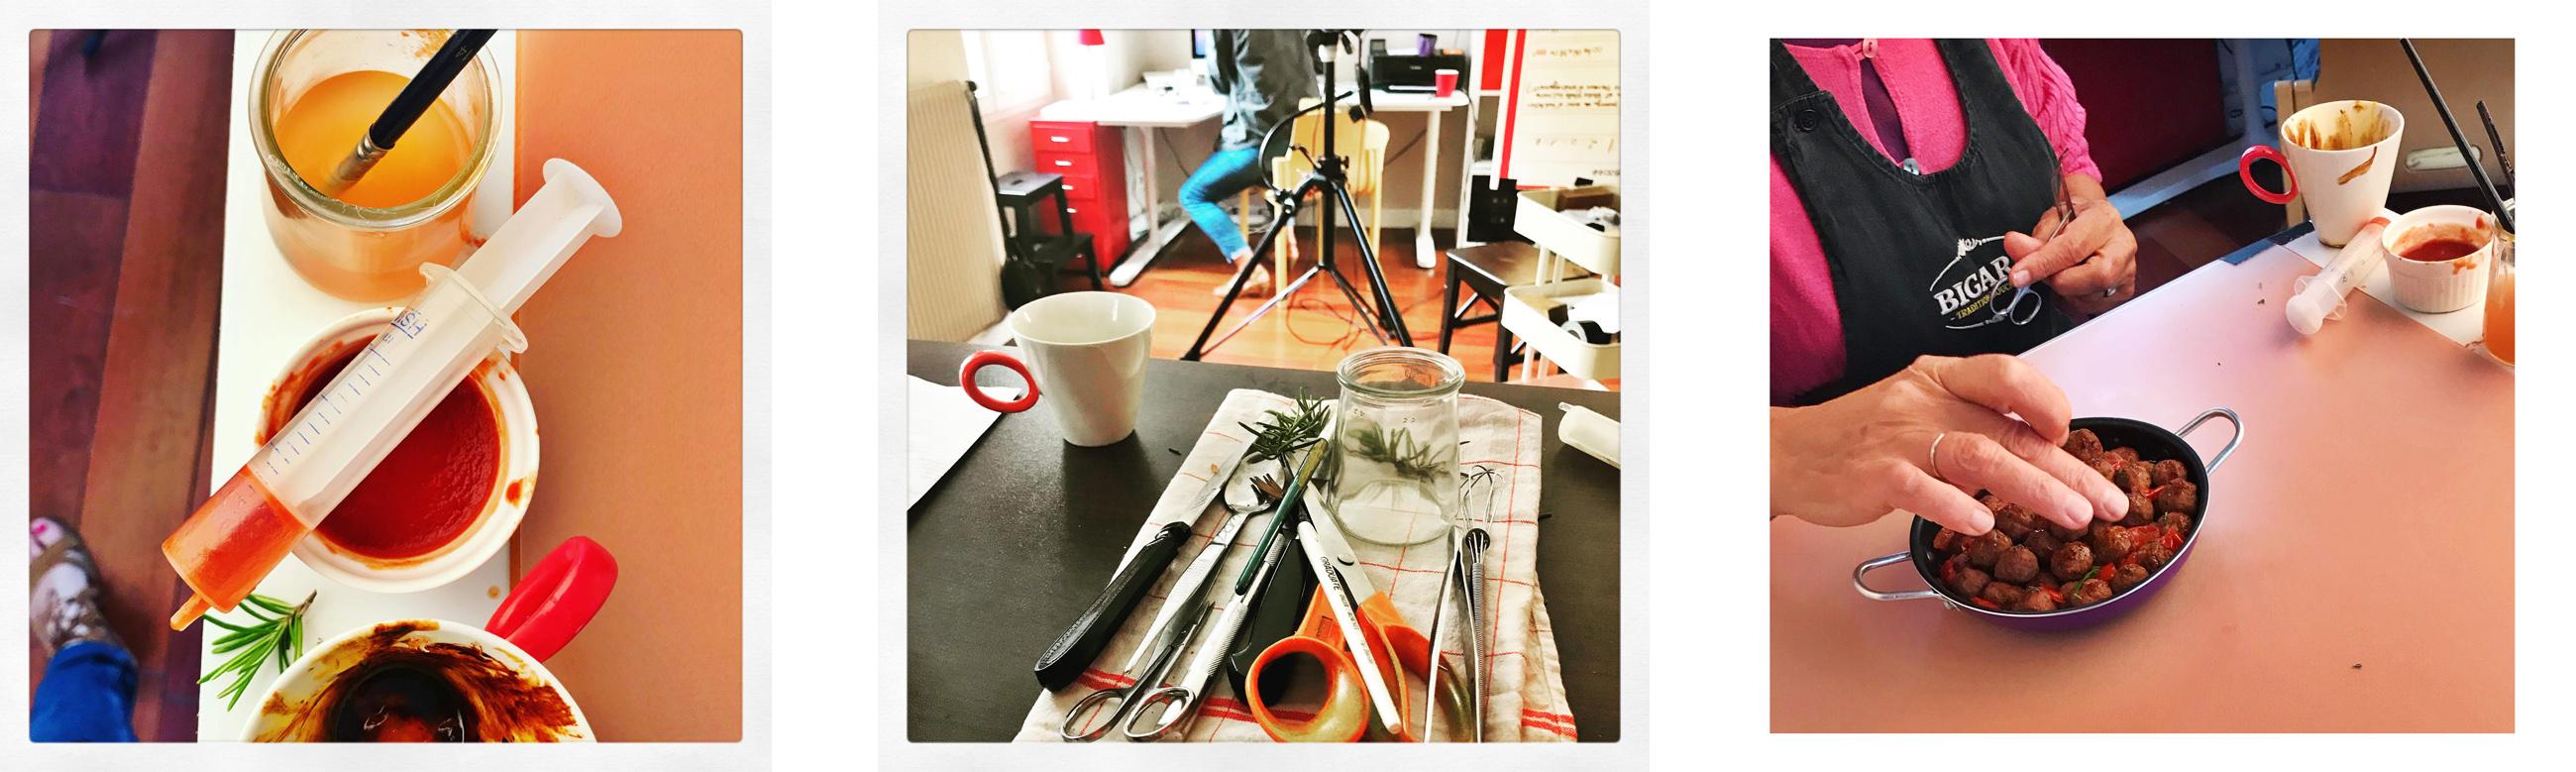 celia-goumard-studio-photo2